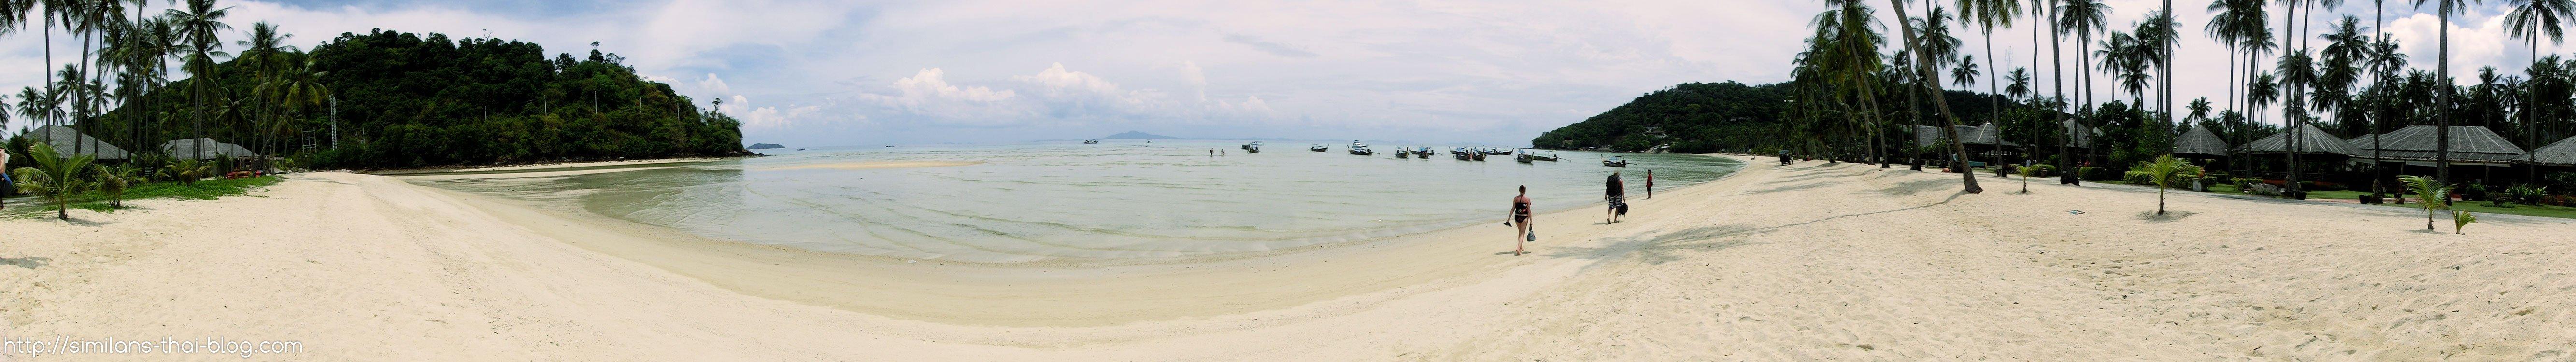 loh-bagao-beach-panorama